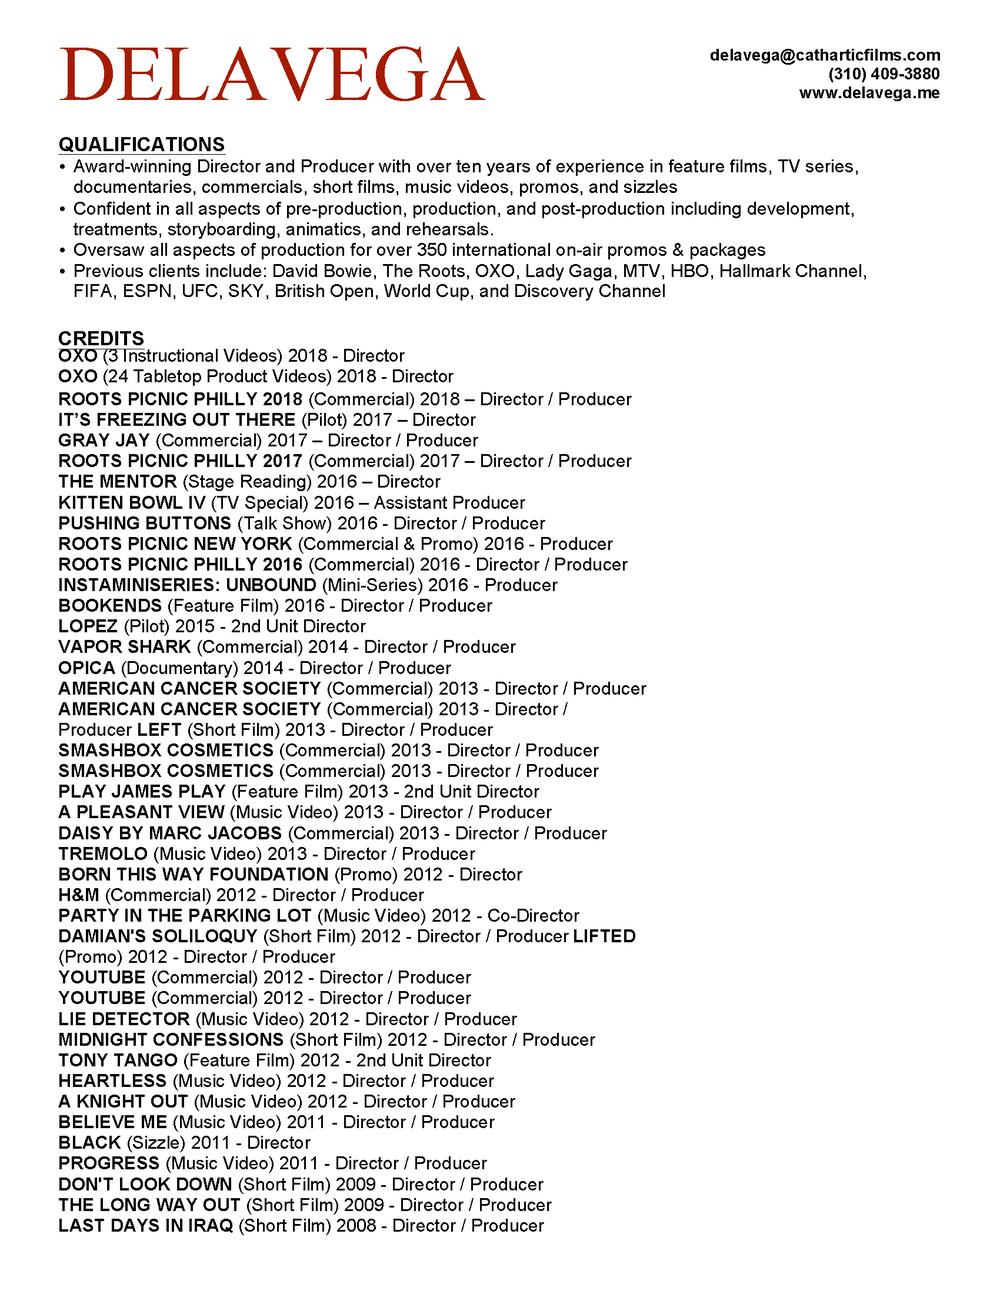 DELAVEGA_resume_180924.png